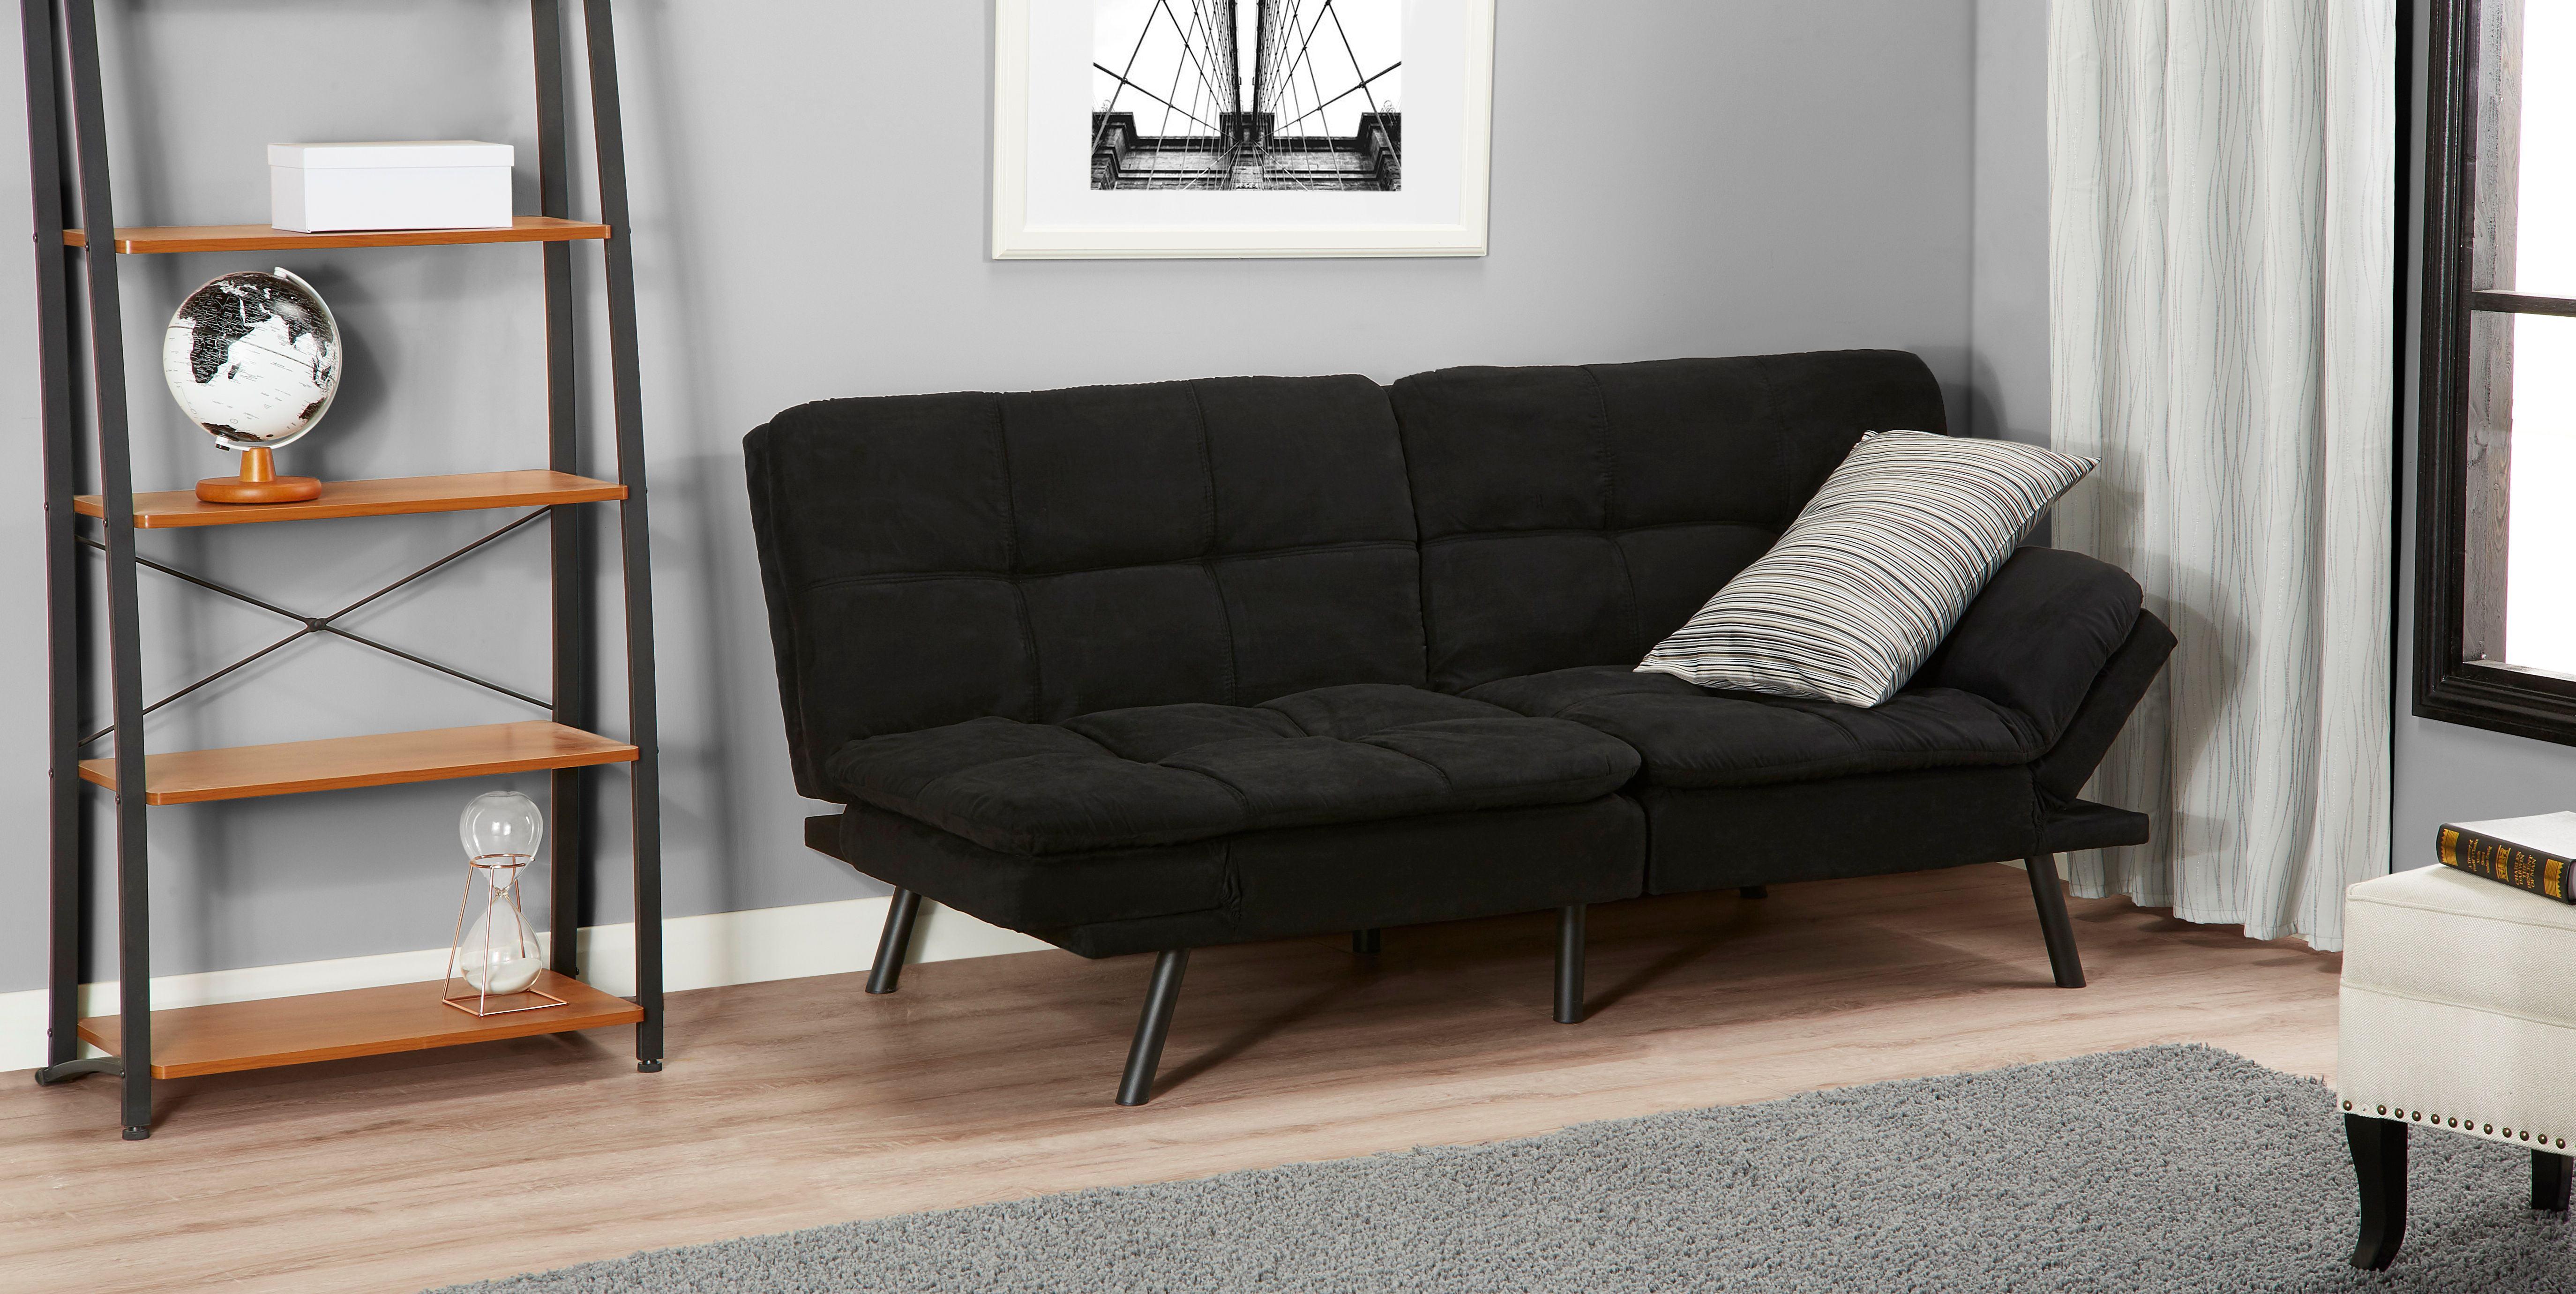 mainstays memory foam futon multiple finishes ebay. Black Bedroom Furniture Sets. Home Design Ideas